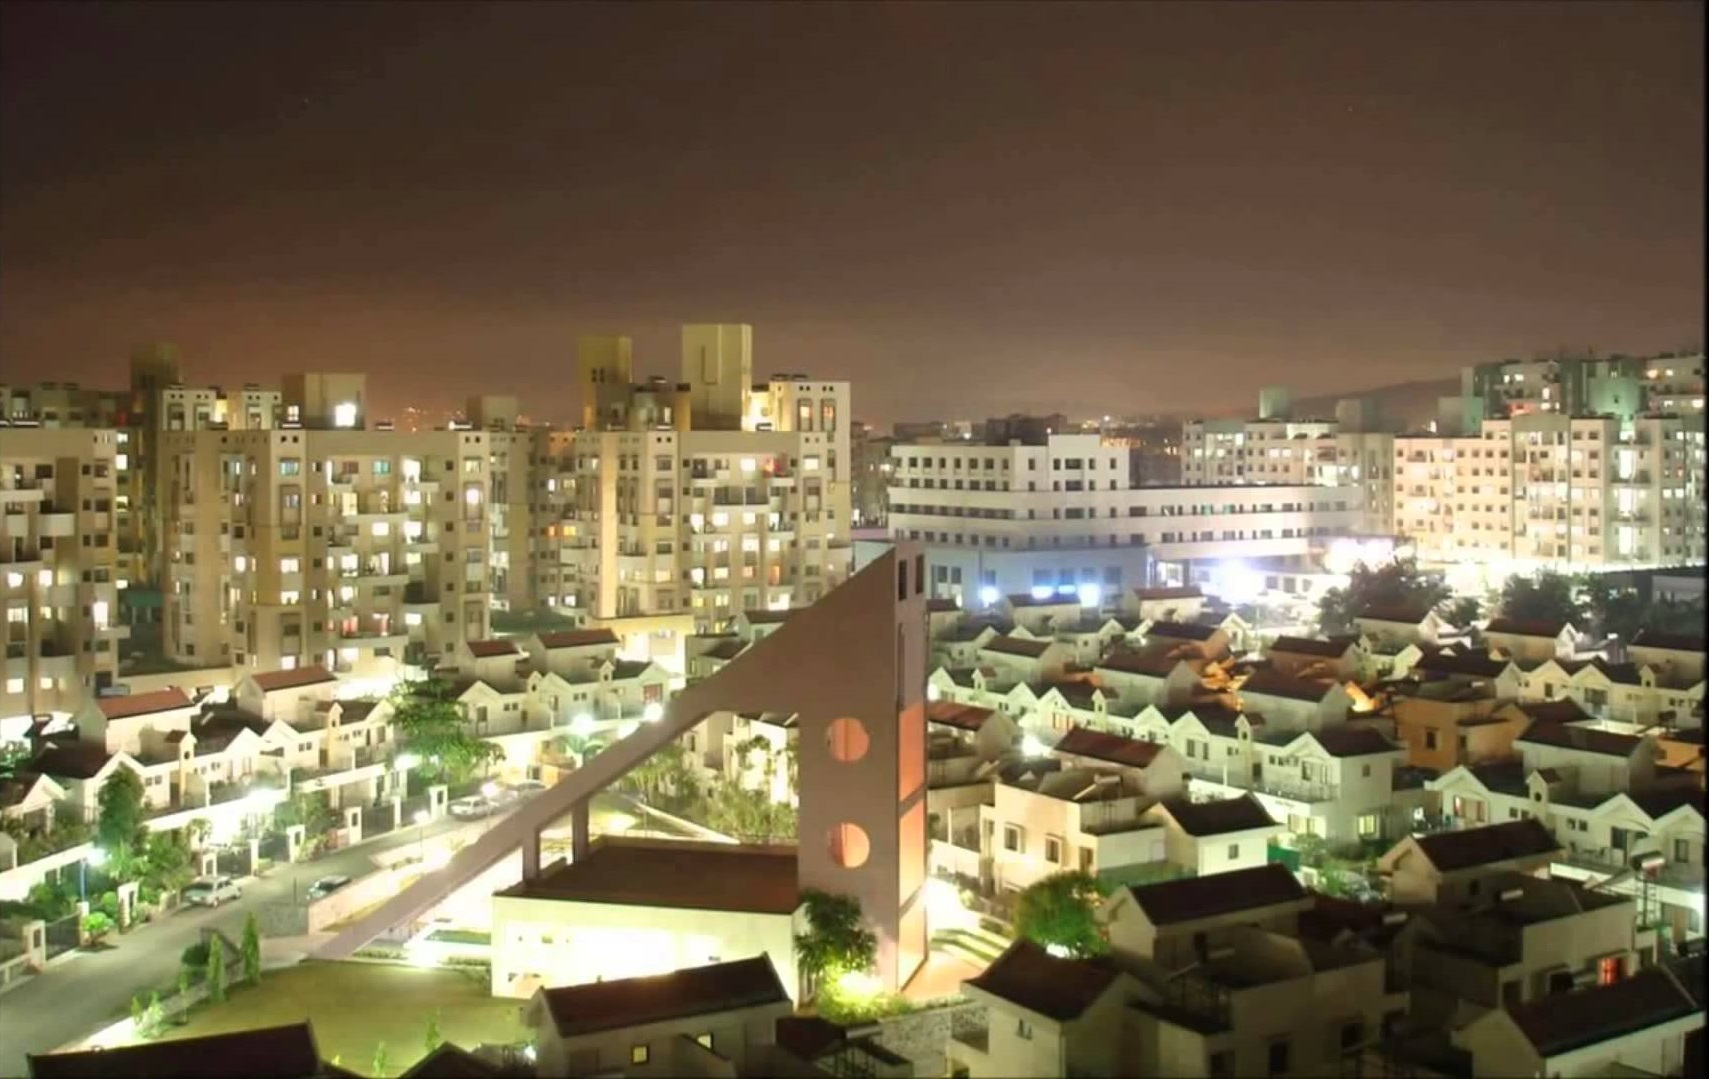 Ease of Living, India, Delhi Mumbai, Chennai, Bengaluru, Kolkata, Pune, Indian cities, Lifestyle news, Offbeat news